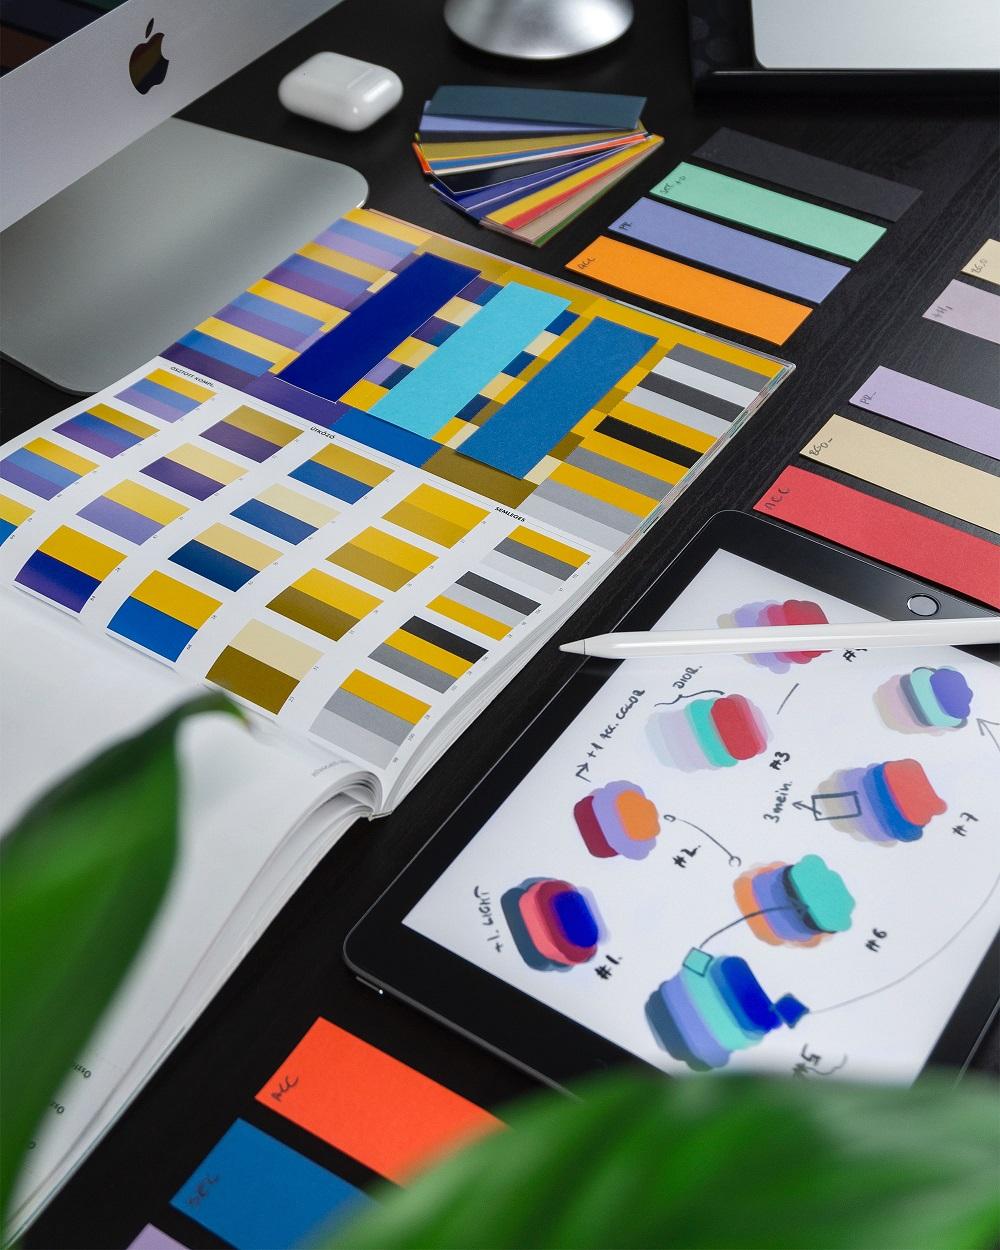 mesa coberta de demonstarções de paletas de cores